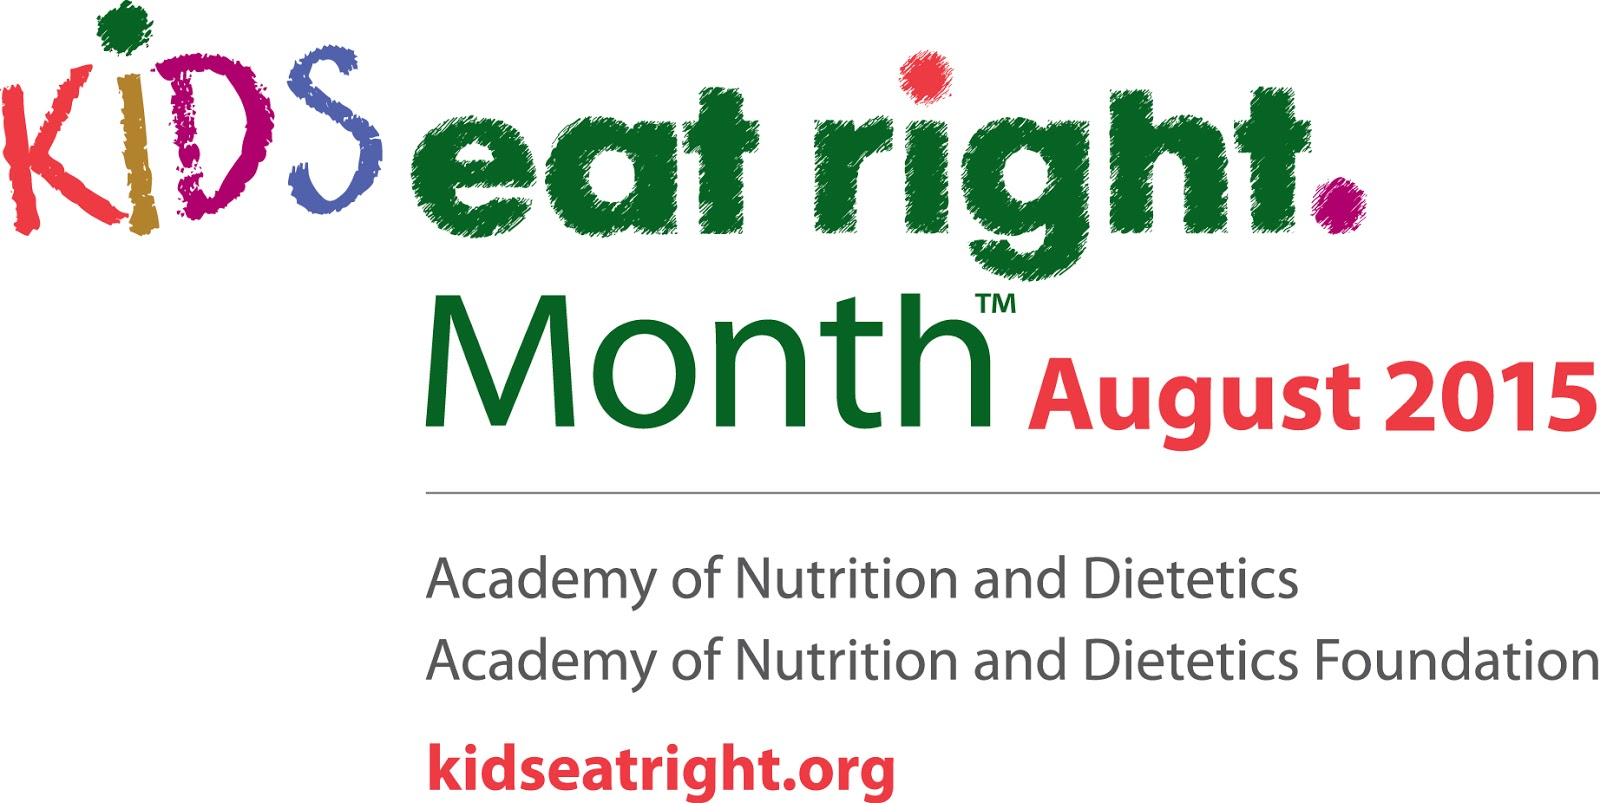 Kids Eat Right: Kid-Friendly Kitchen Tasks